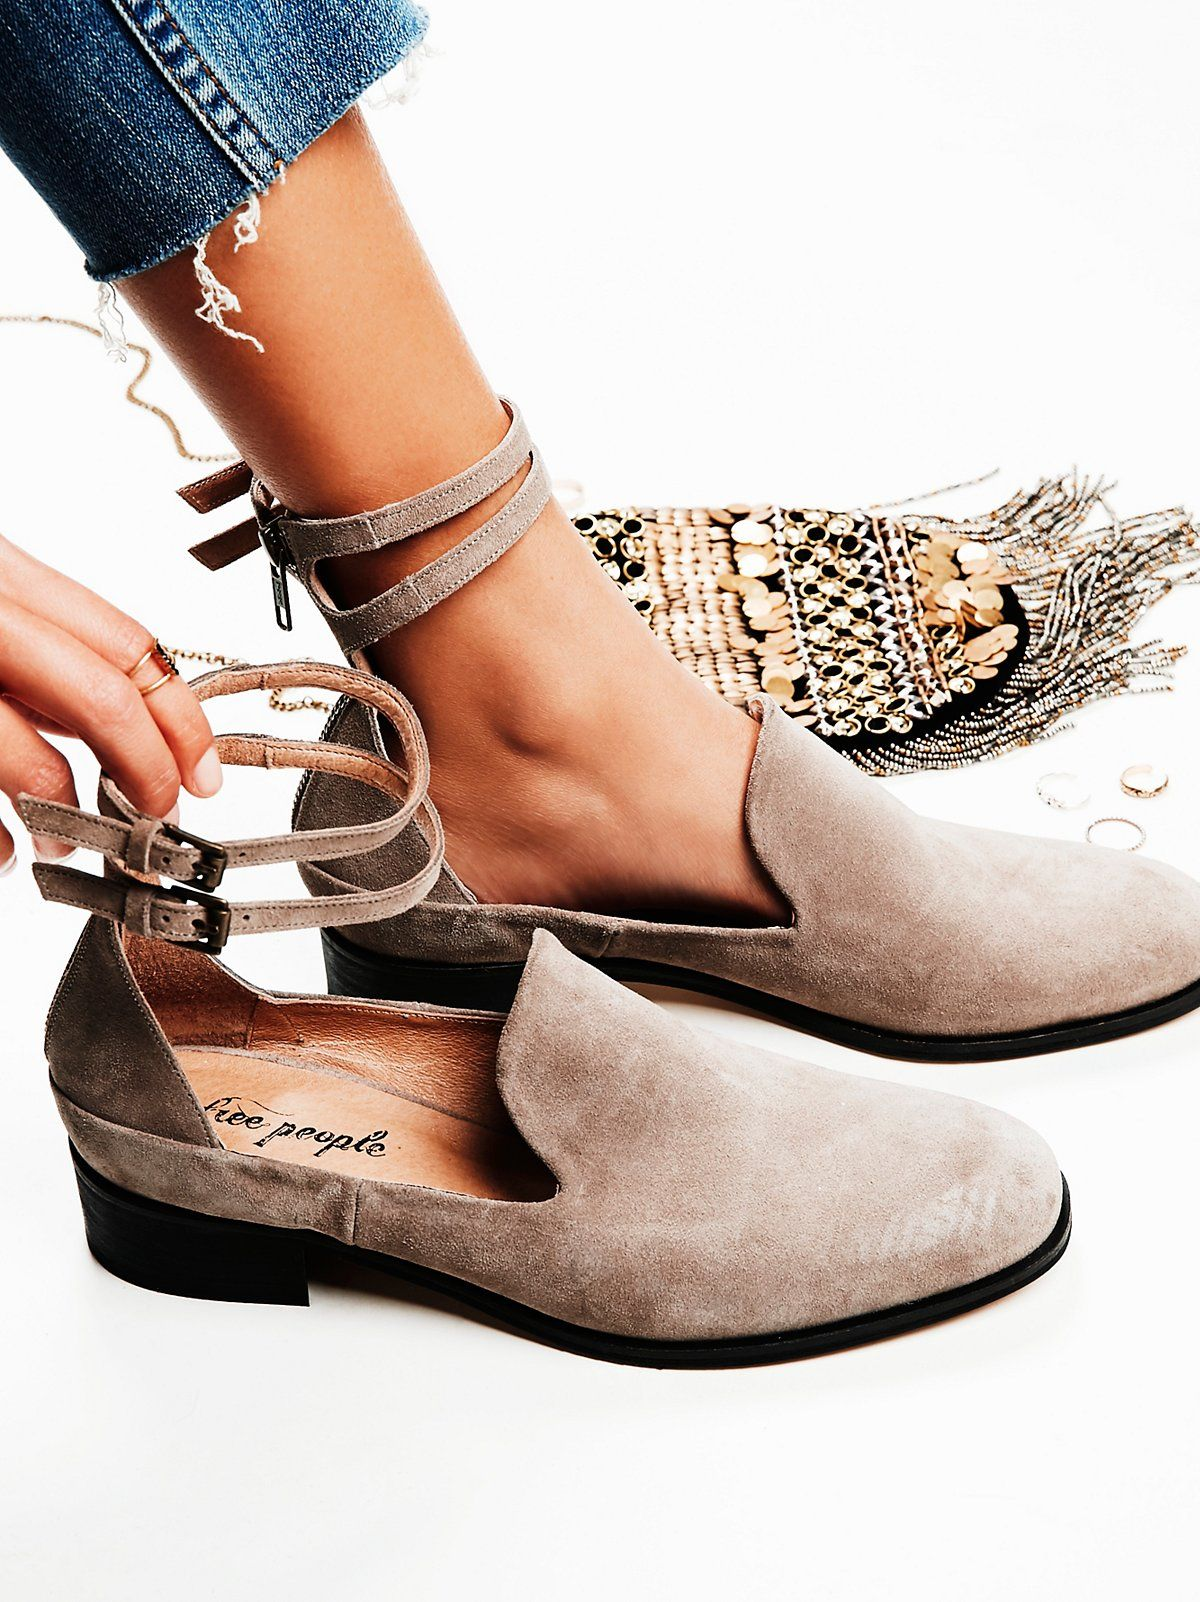 07ecce44bdb0 Lenox Flat. Loafers Outfit SummerBlock Heels ...